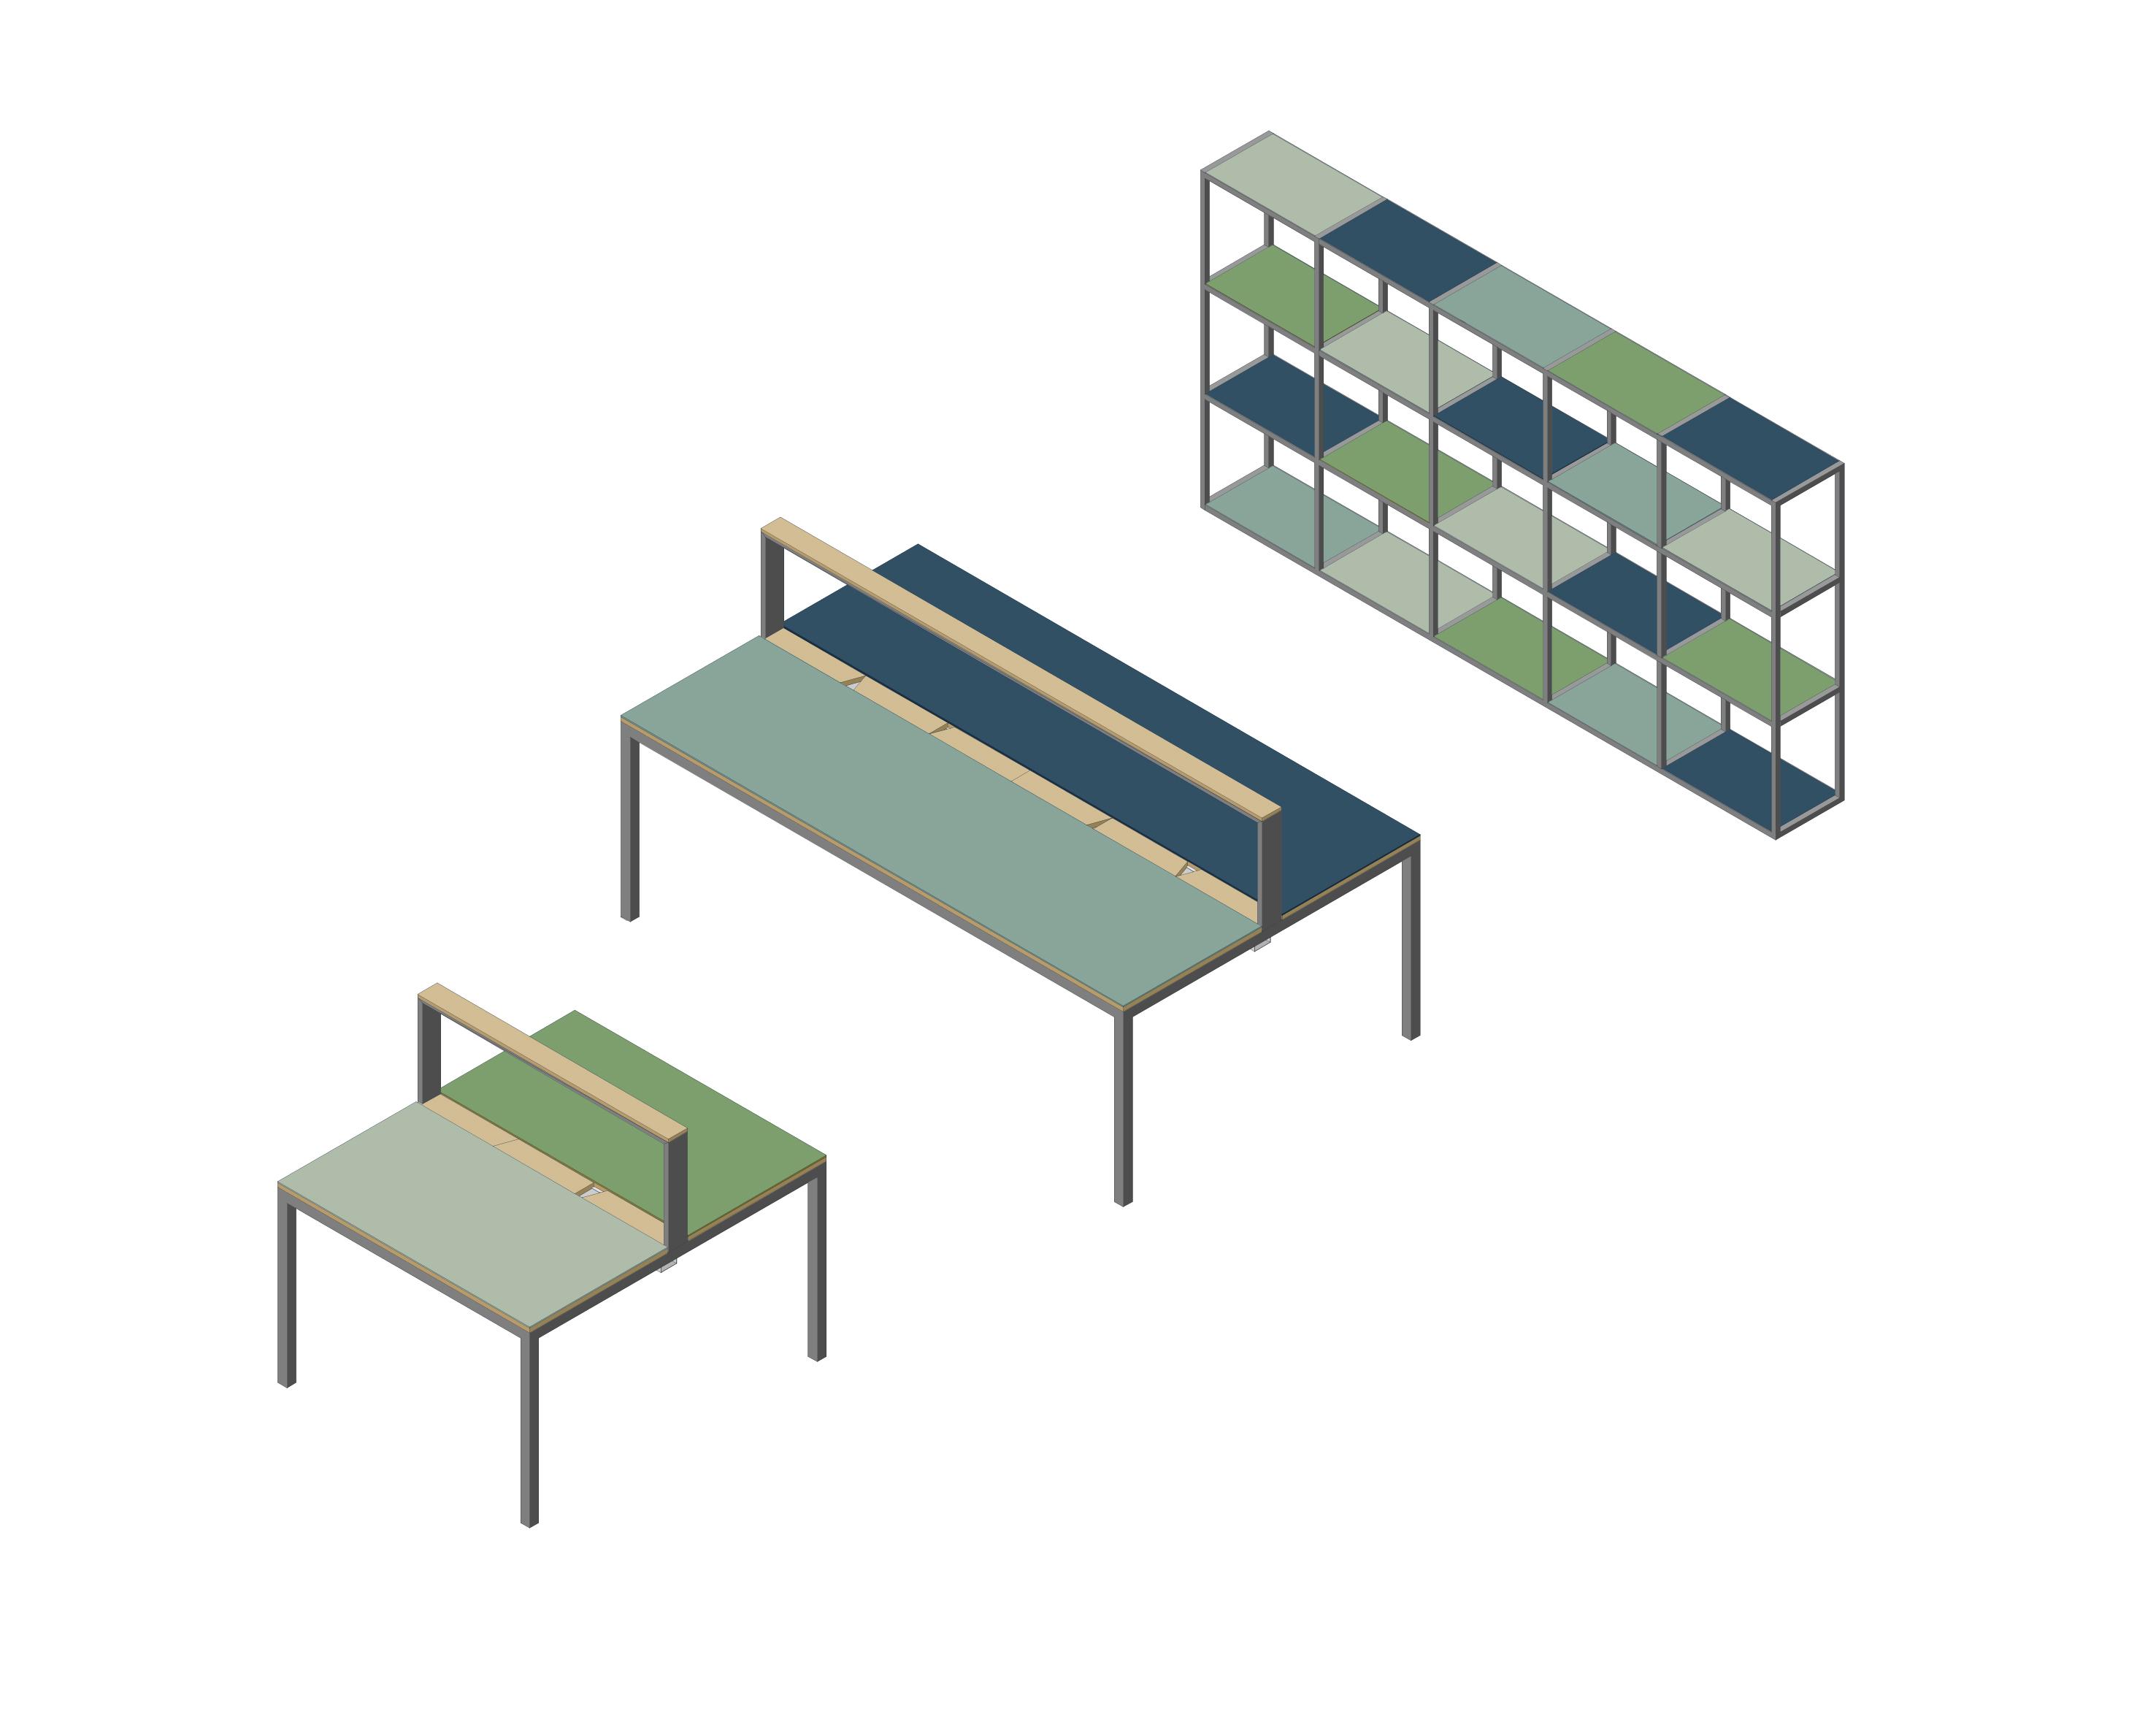 Bur furniture architizer for Buro fourniture